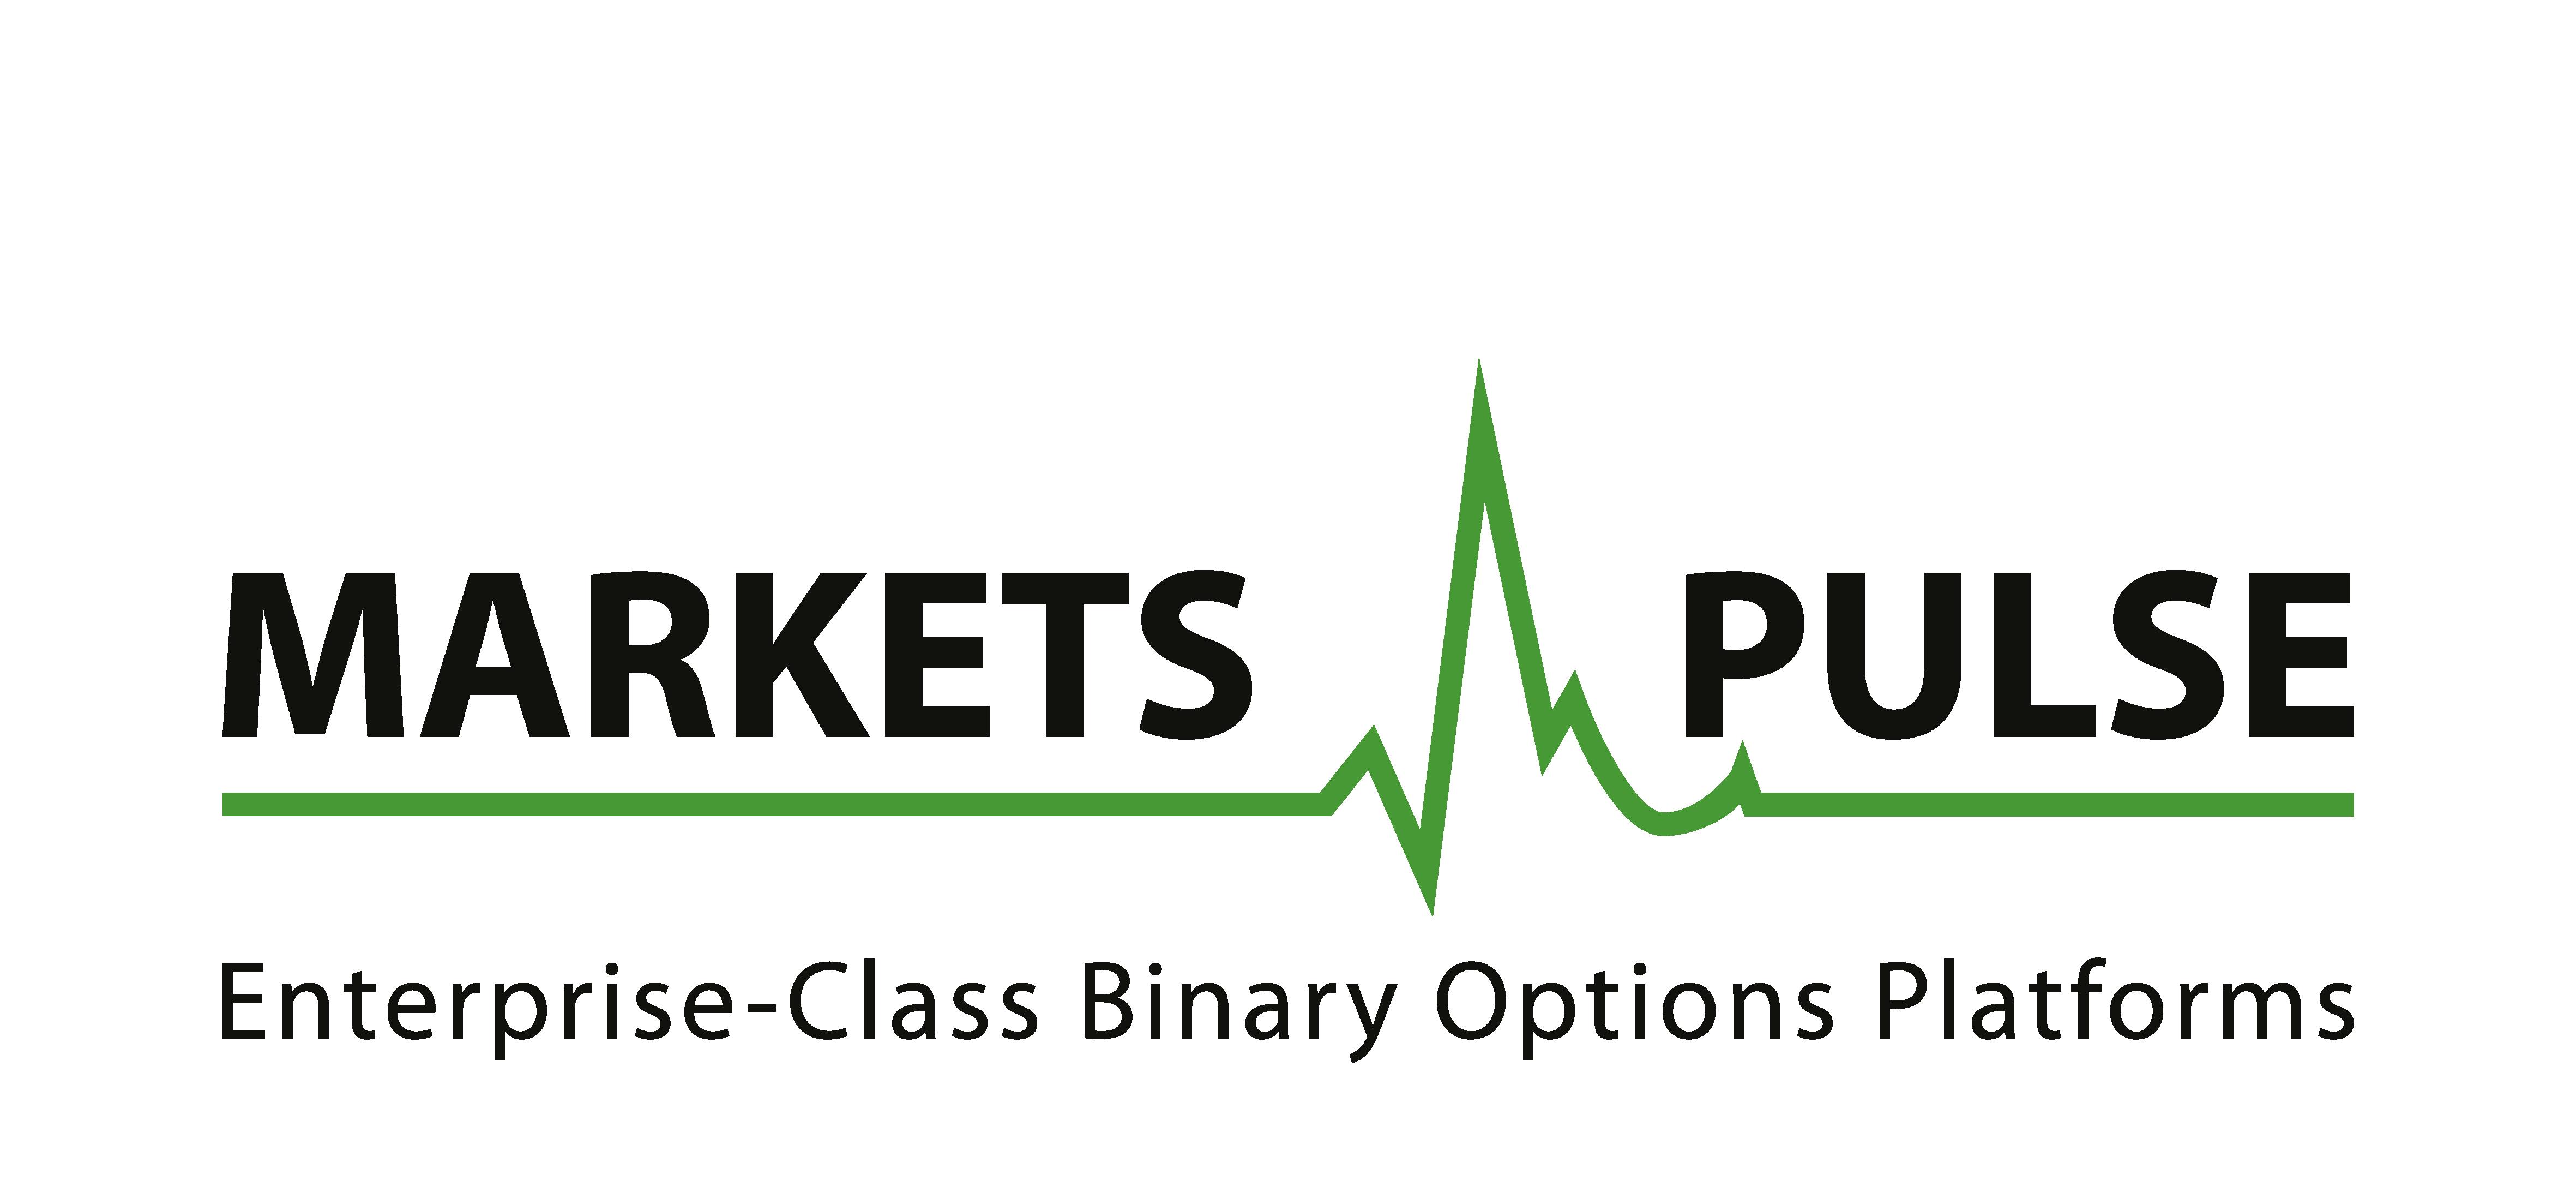 Binary options markets world